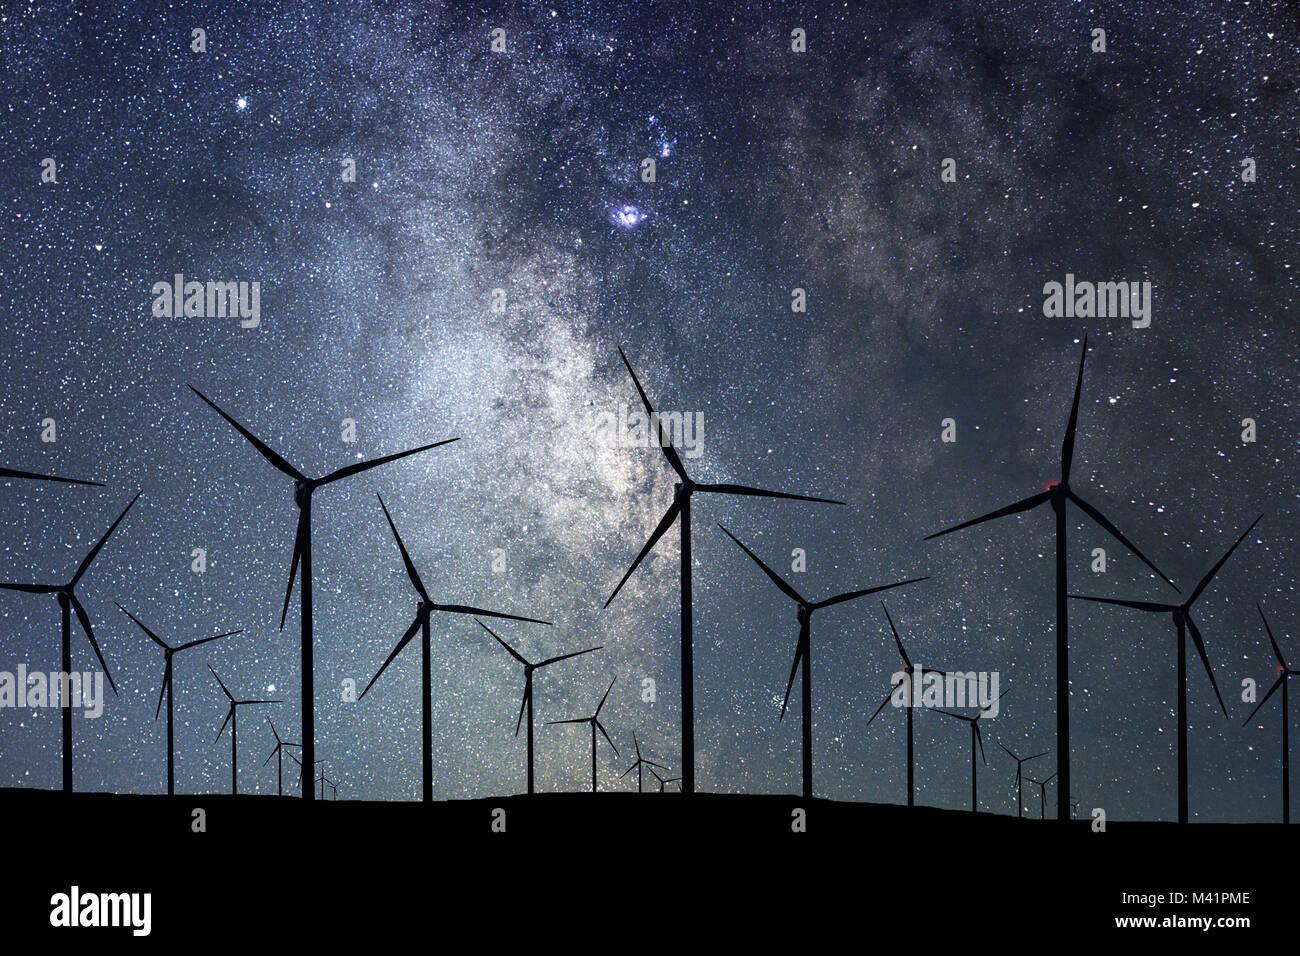 Night Sky Over Wind Farm. Energy and nature Night Sky. - Stock Image